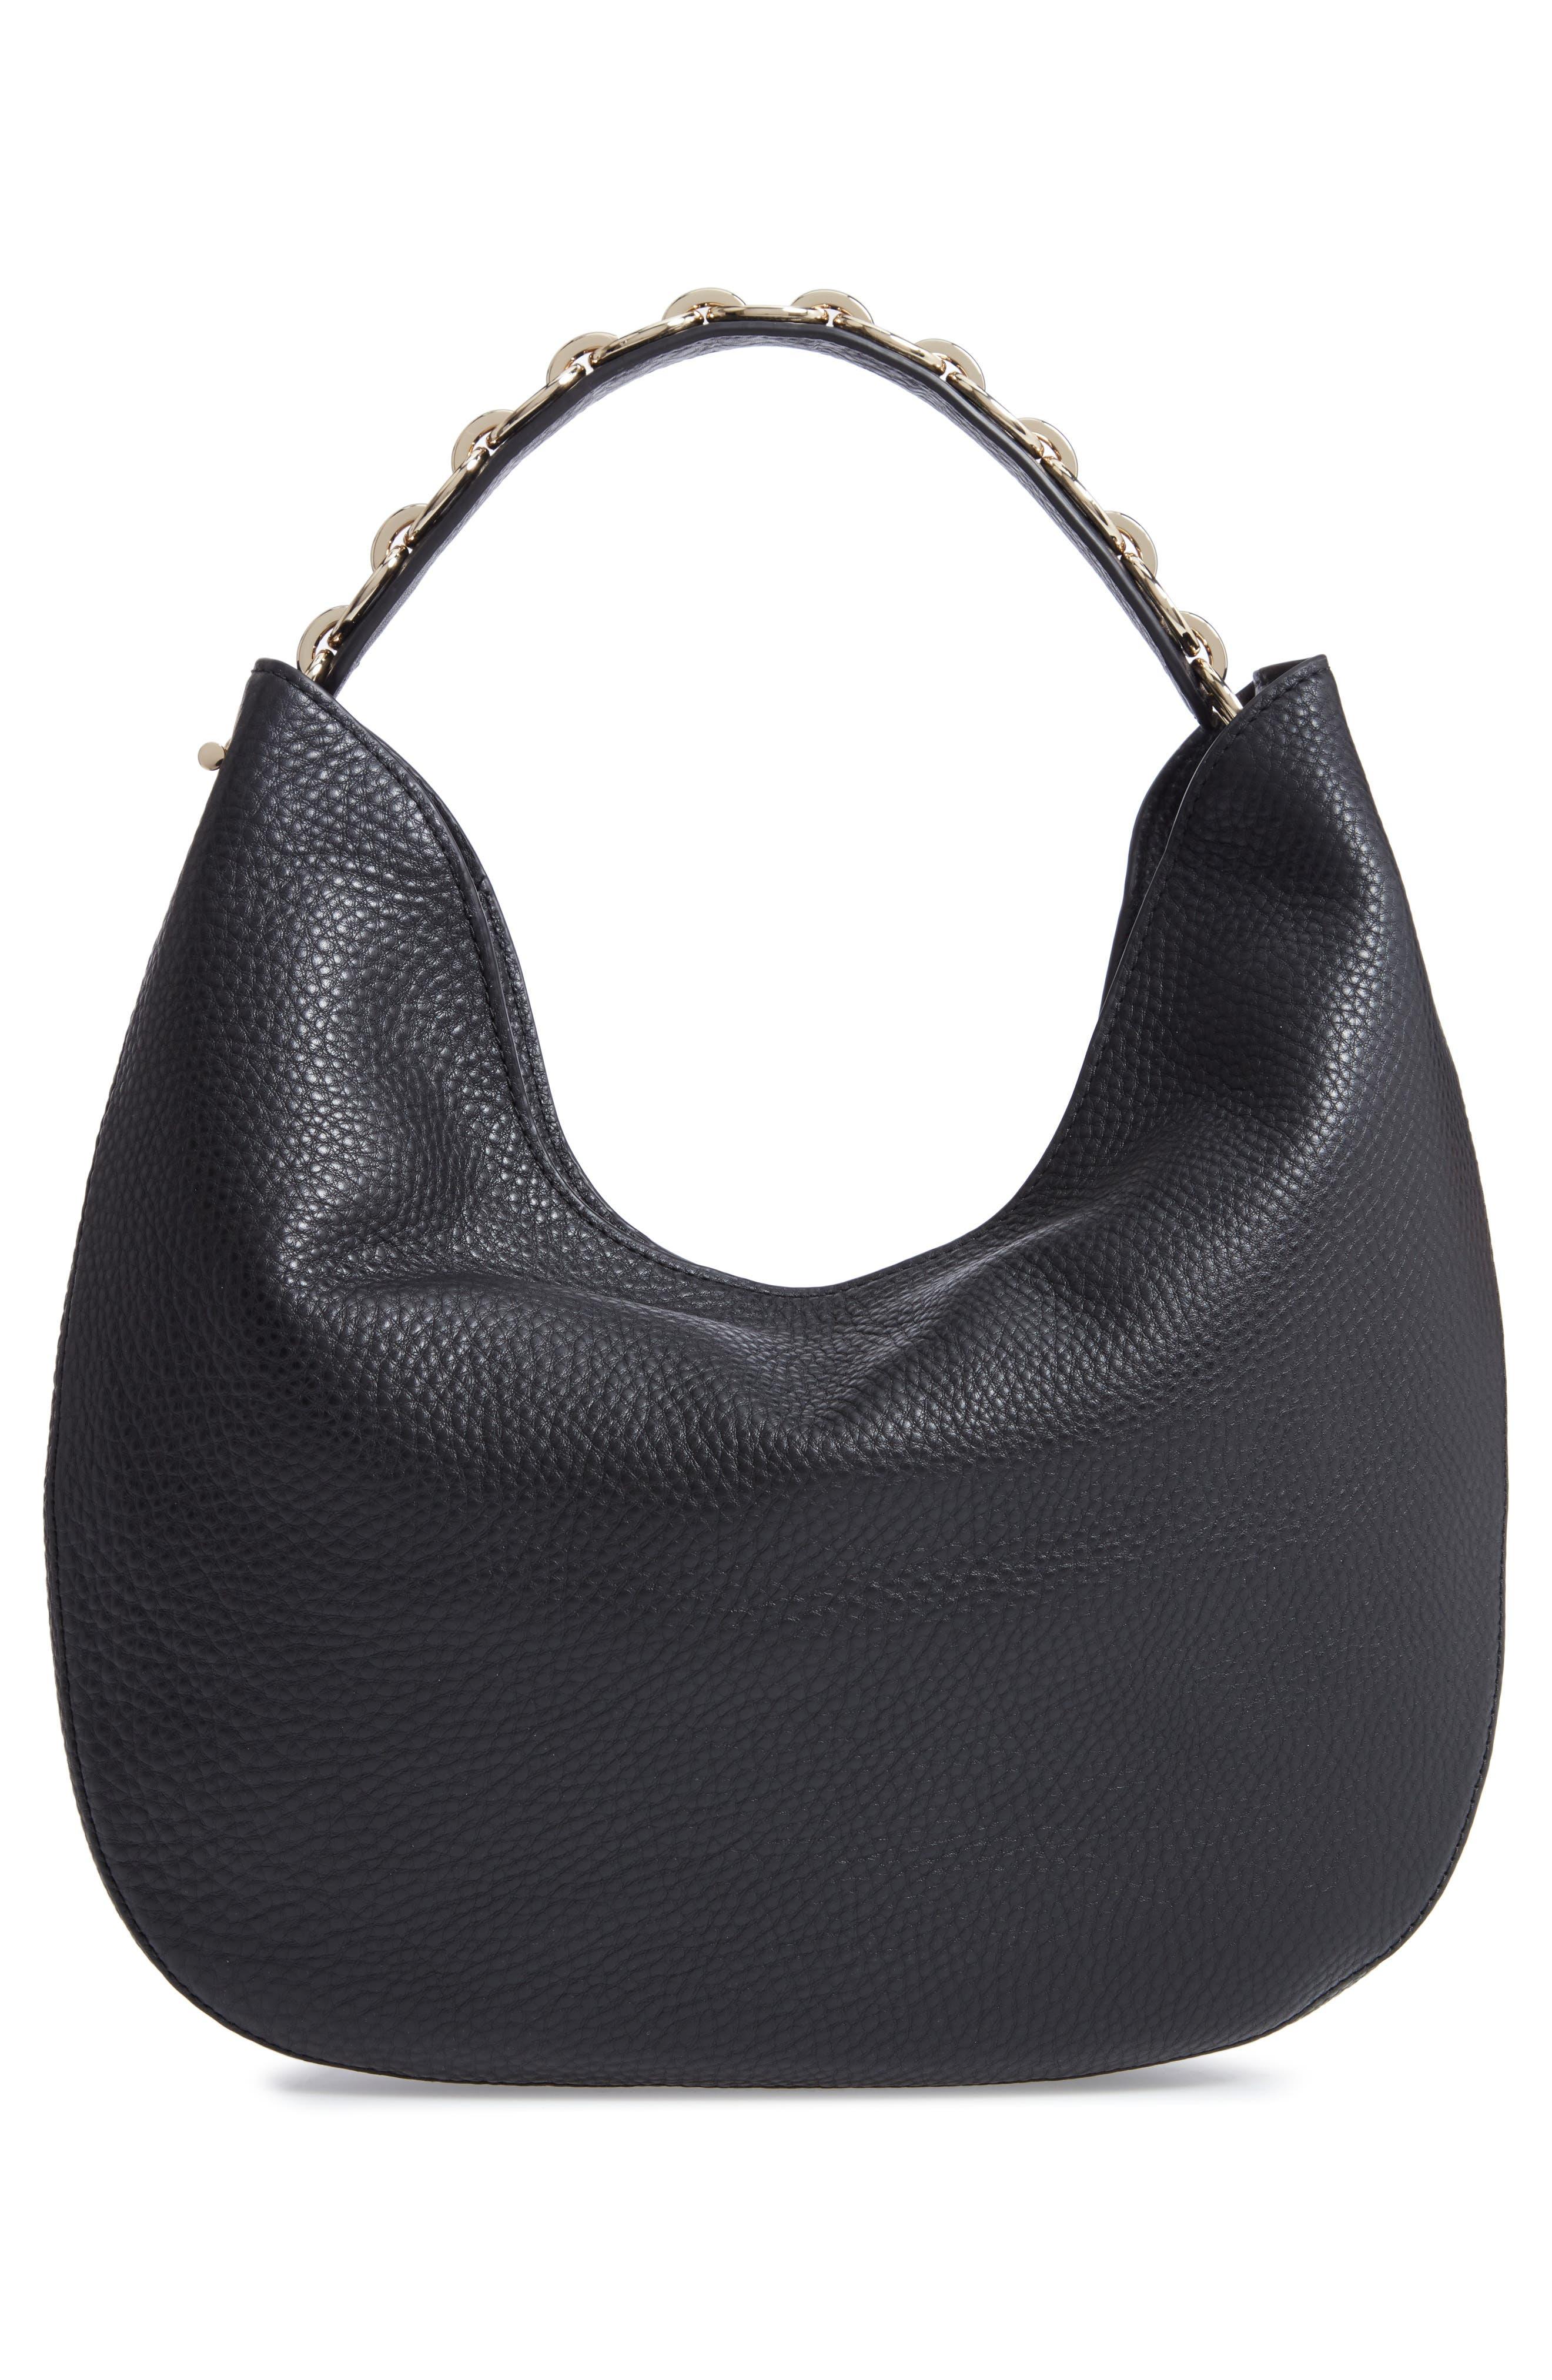 murray street heather pebbled leather hobo bag,                             Alternate thumbnail 3, color,                             BLACK